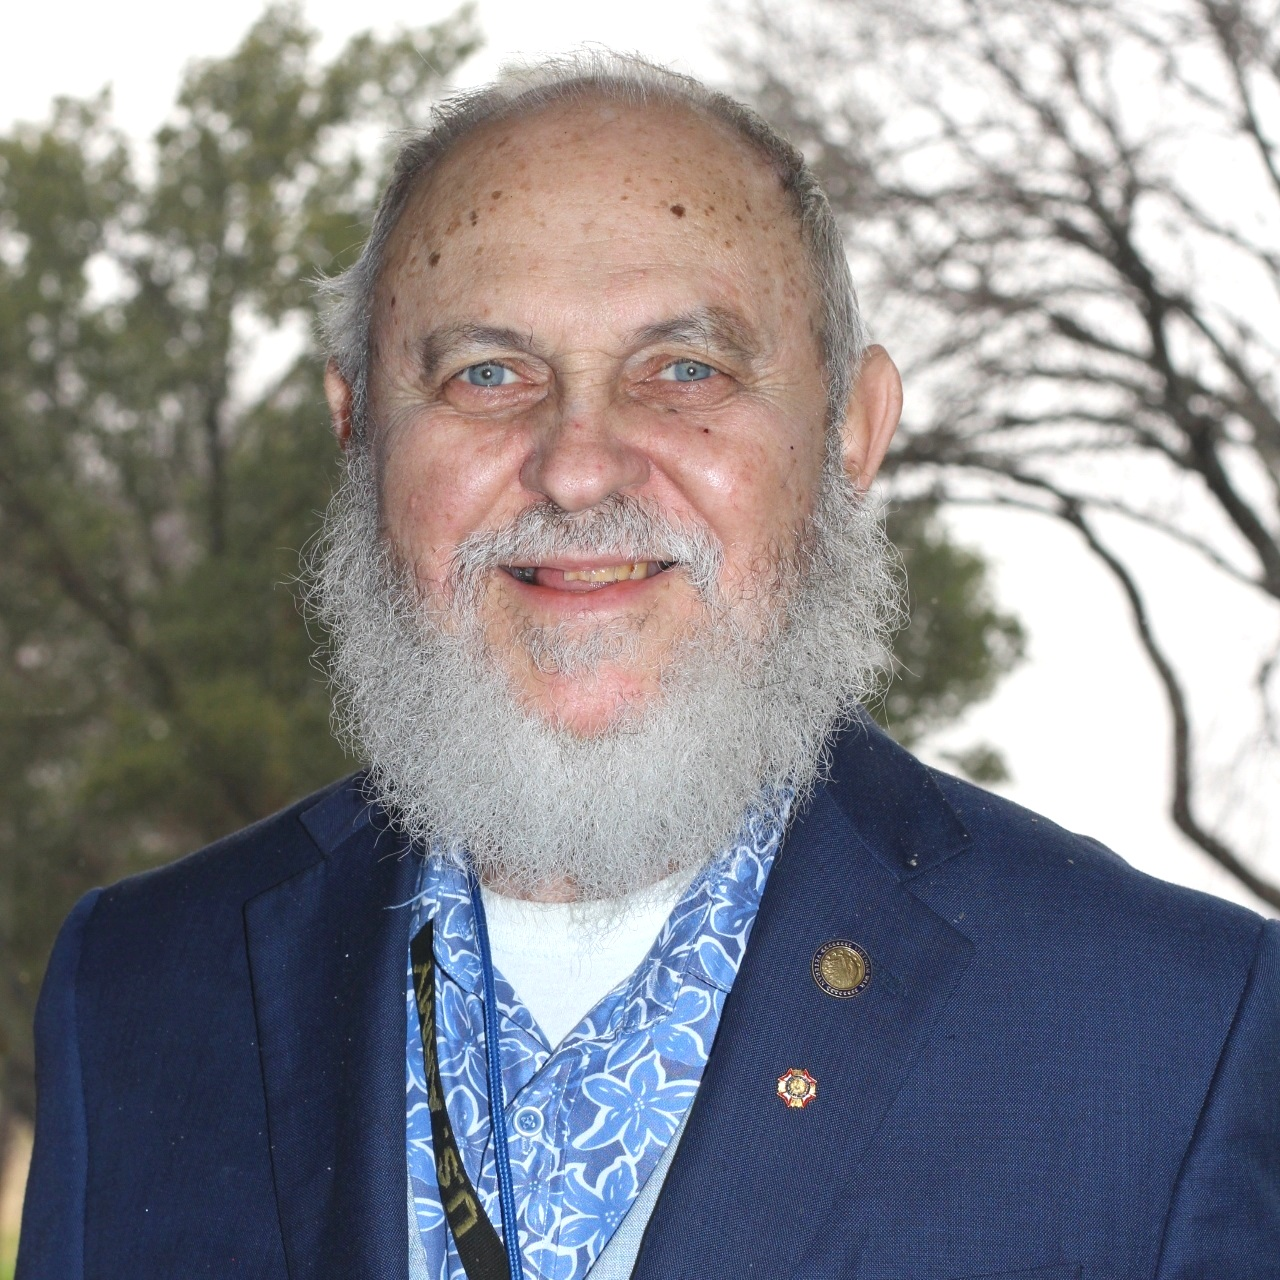 Chaplain  Roger Tate